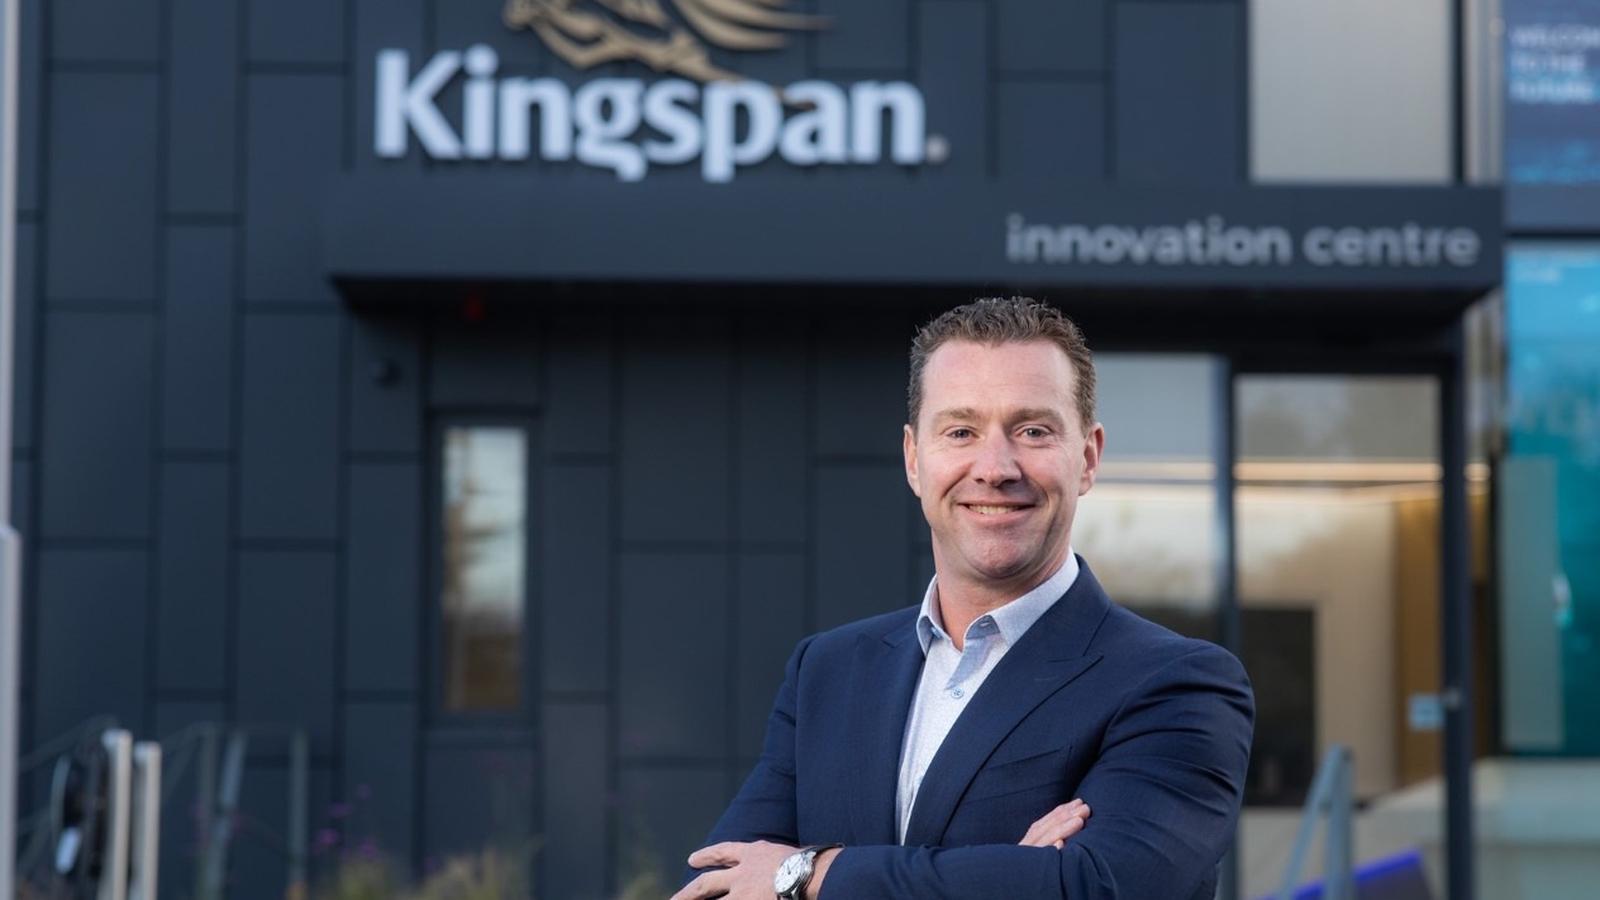 Kingspan's first quarter sales up 24%